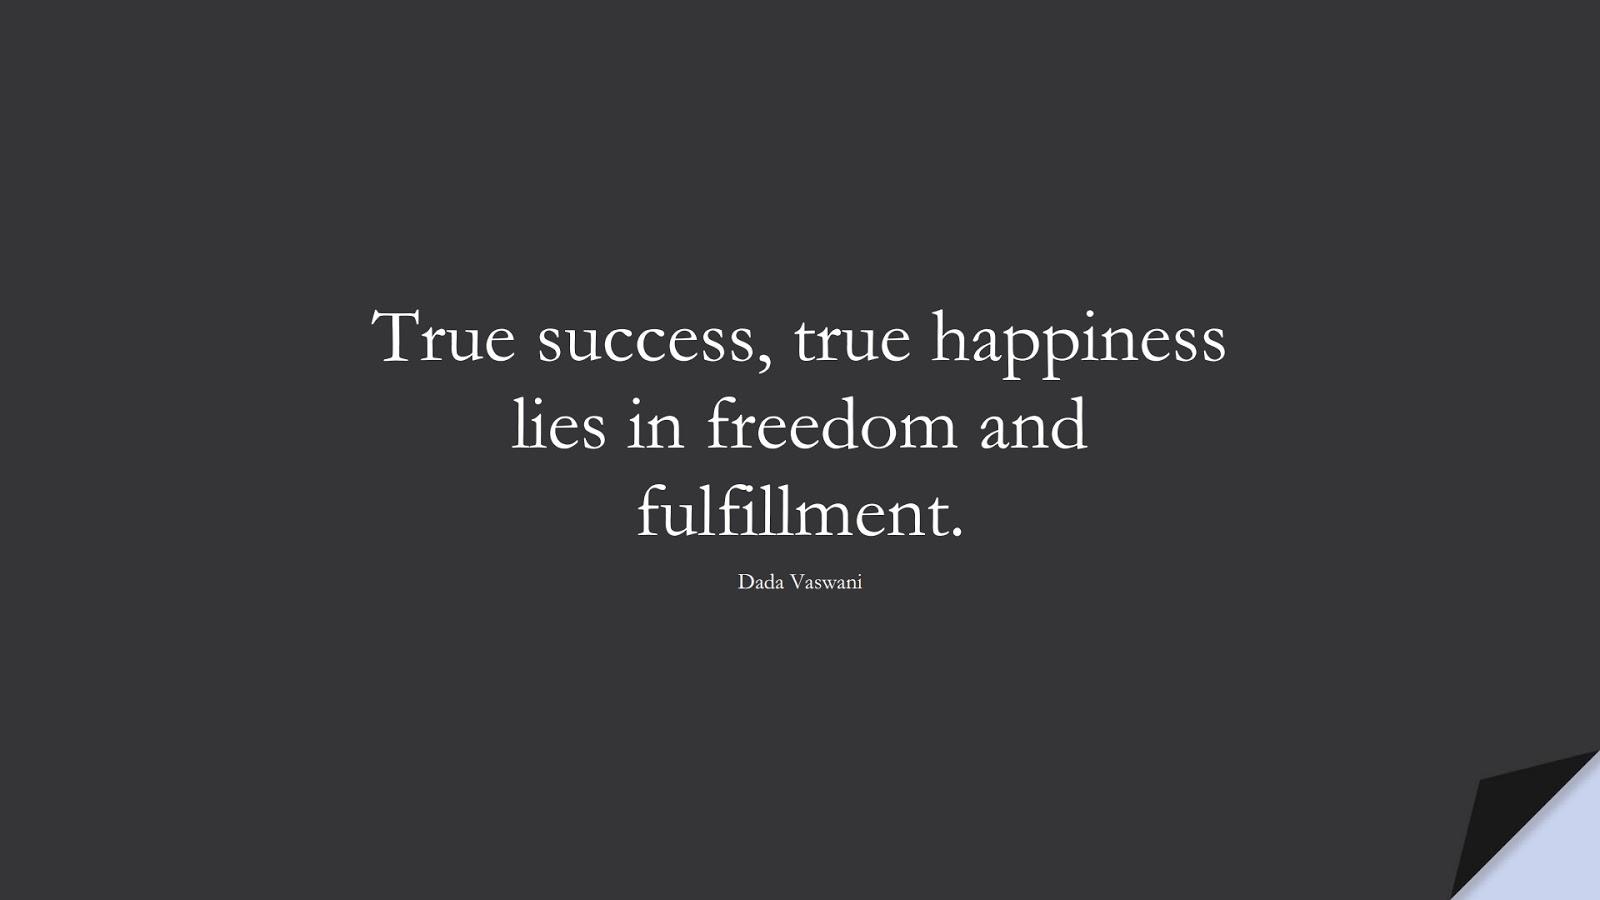 True success, true happiness lies in freedom and fulfillment. (Dada Vaswani);  #SuccessQuotes